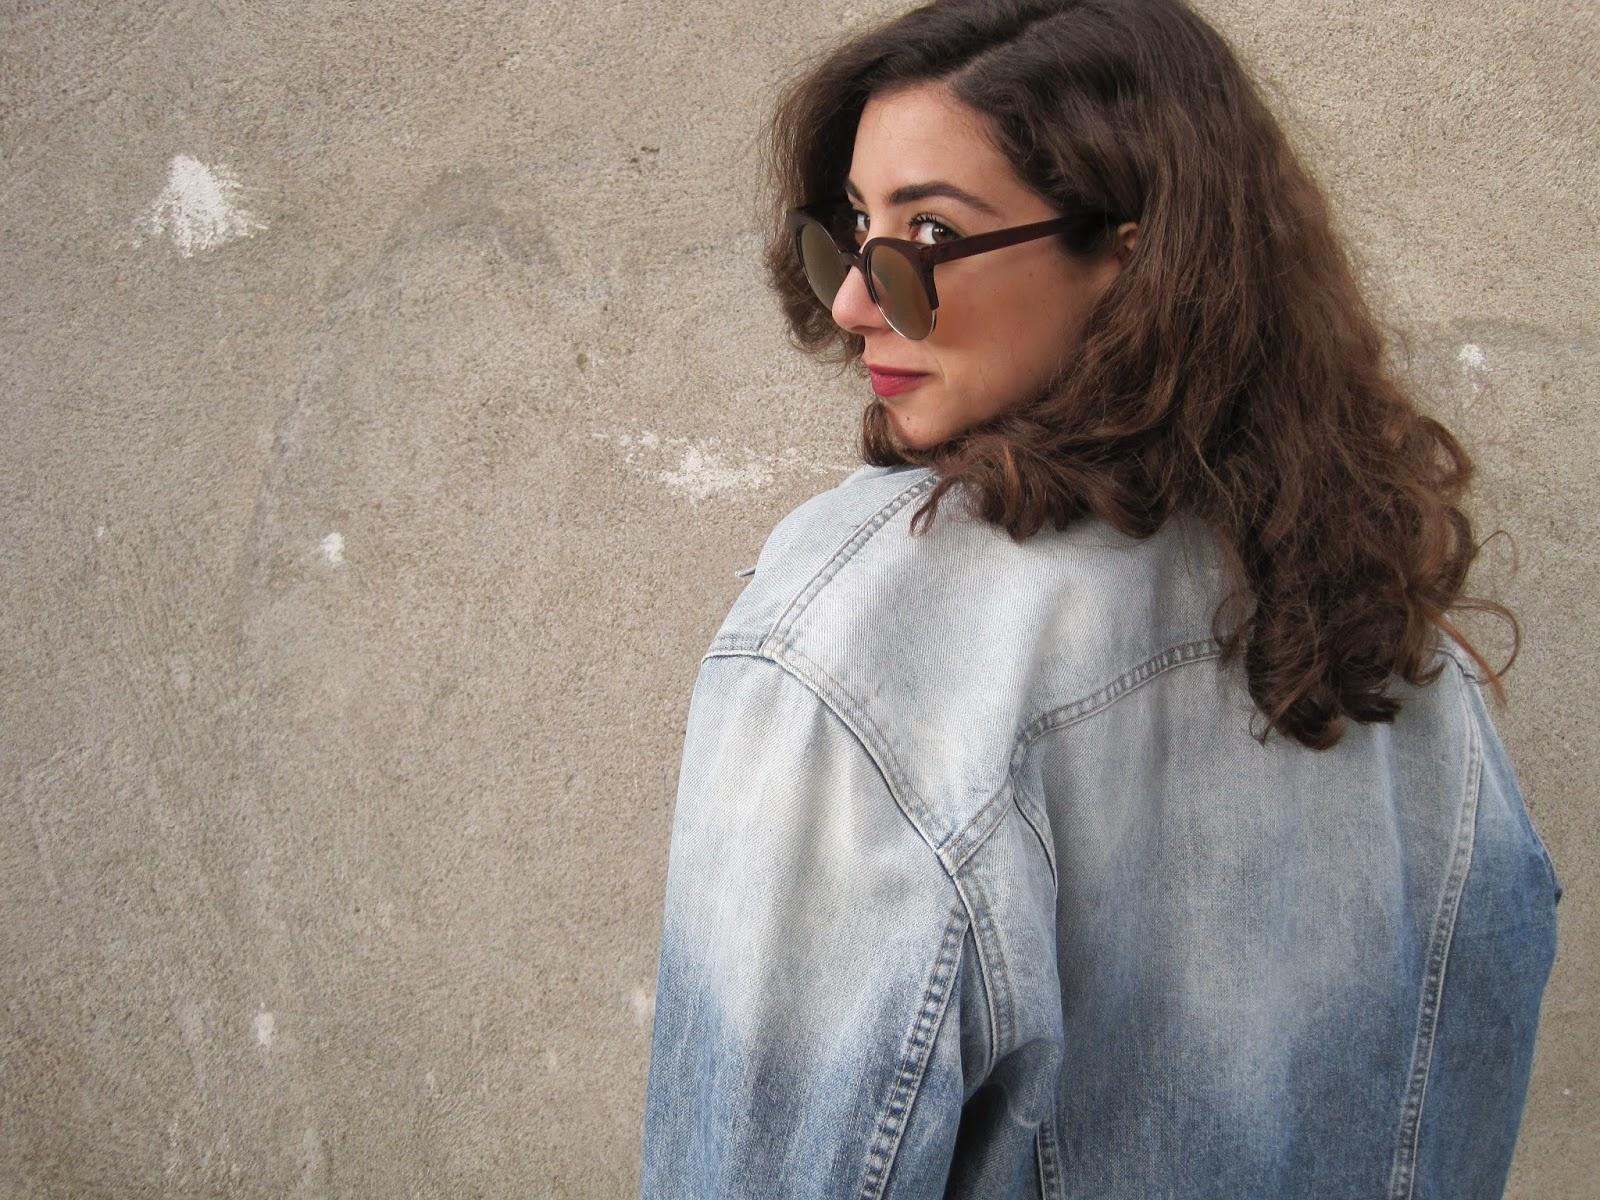 gas, denim, jacket, vintage